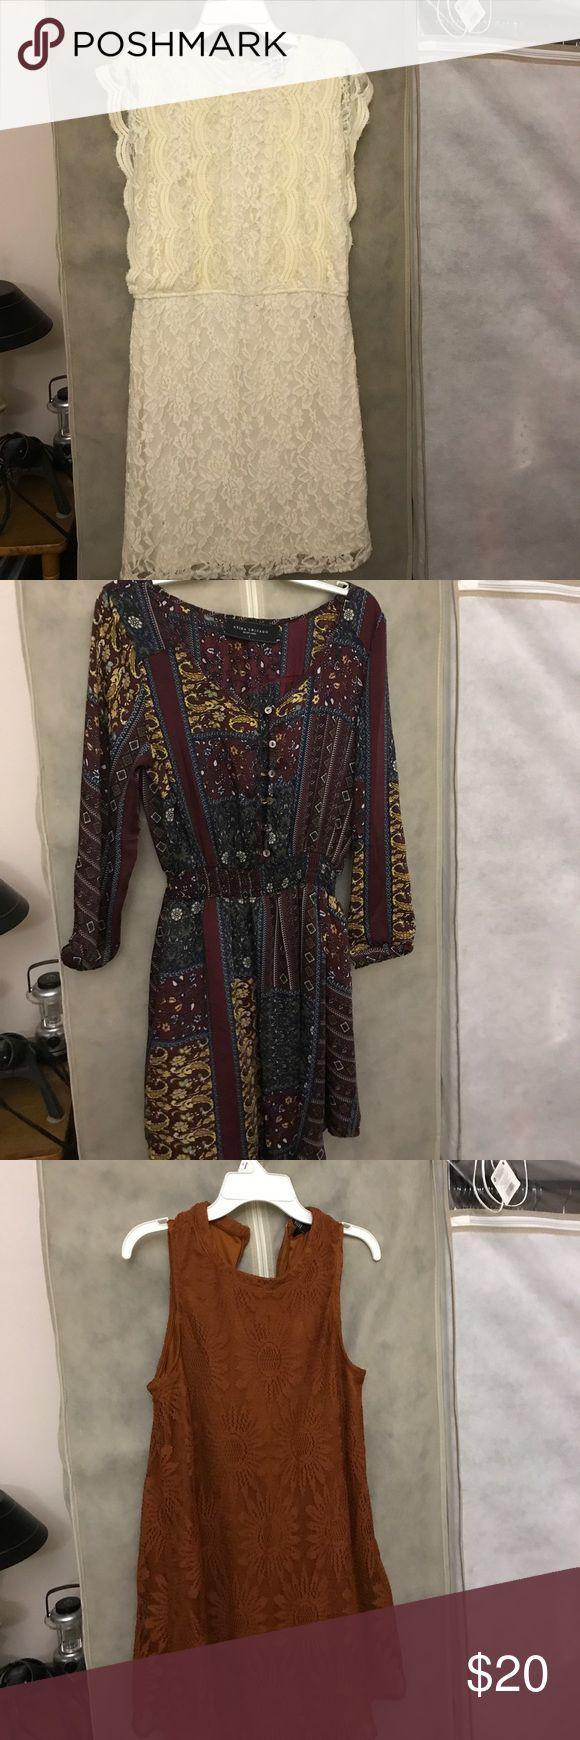 Casual dresses A casual dress color cream ,party dresses bar 111 Dresses